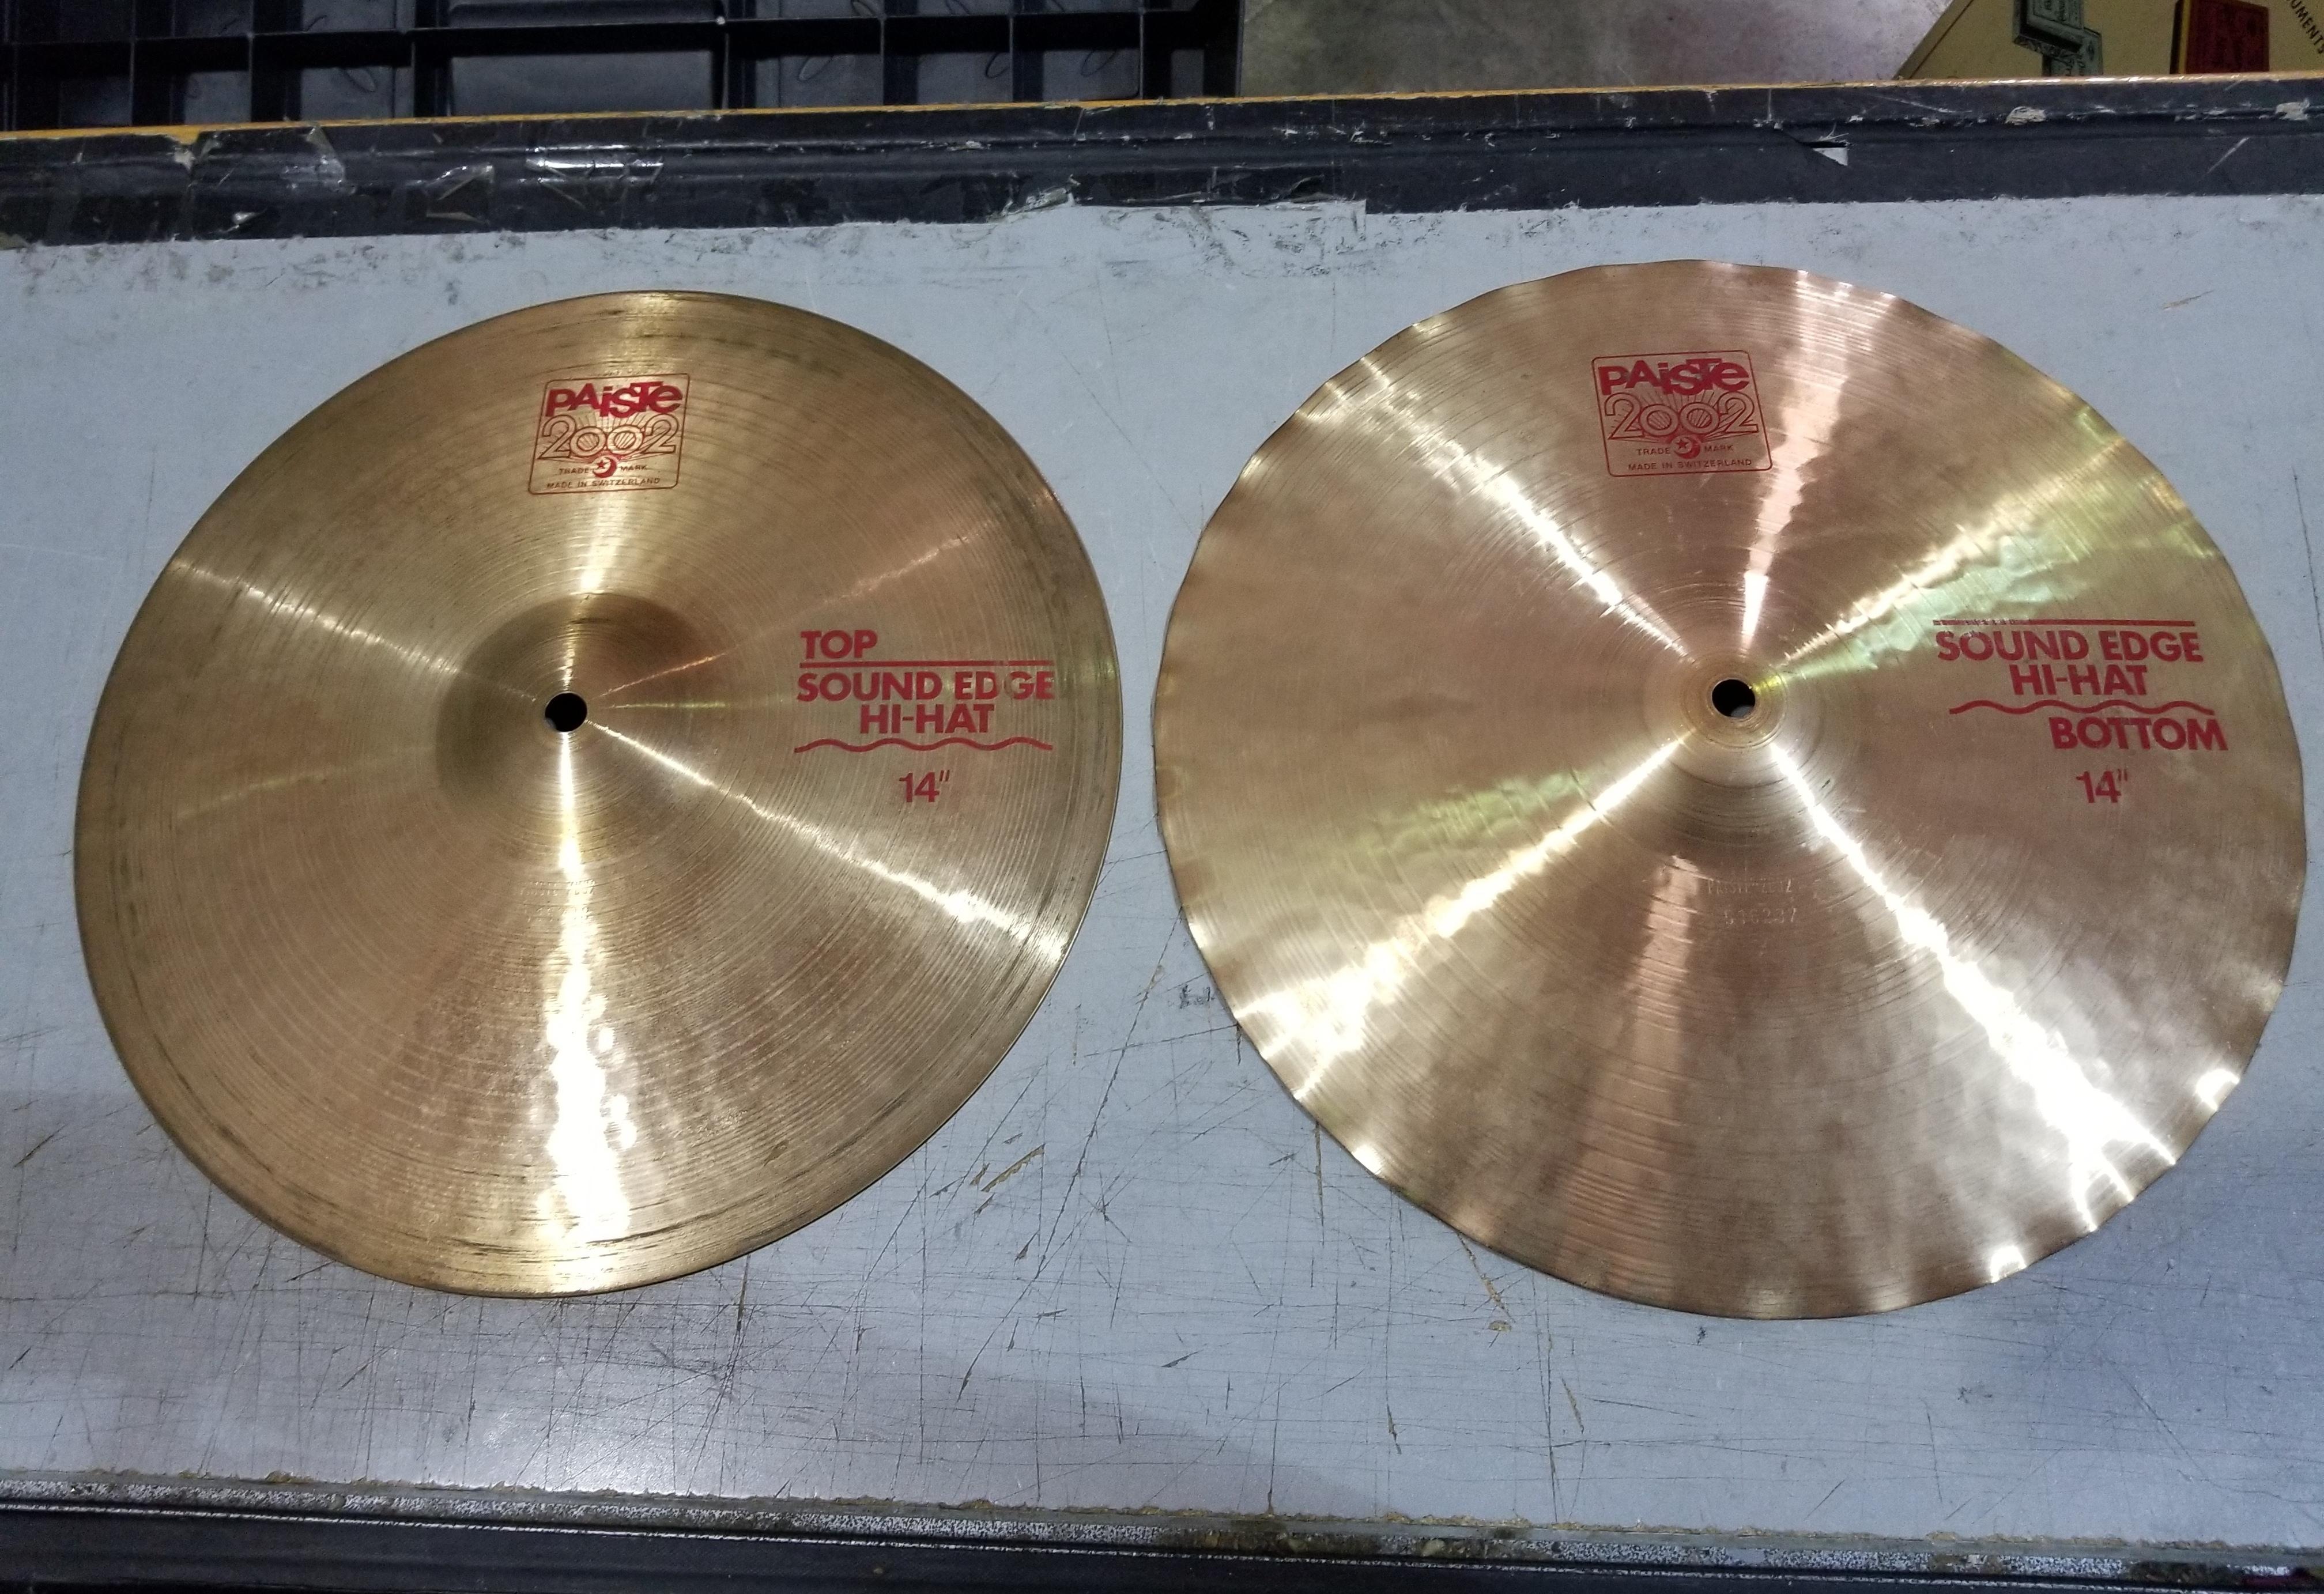 PAISTE 2002 Sound Edge Hi-Hat Cymbals Pair 14